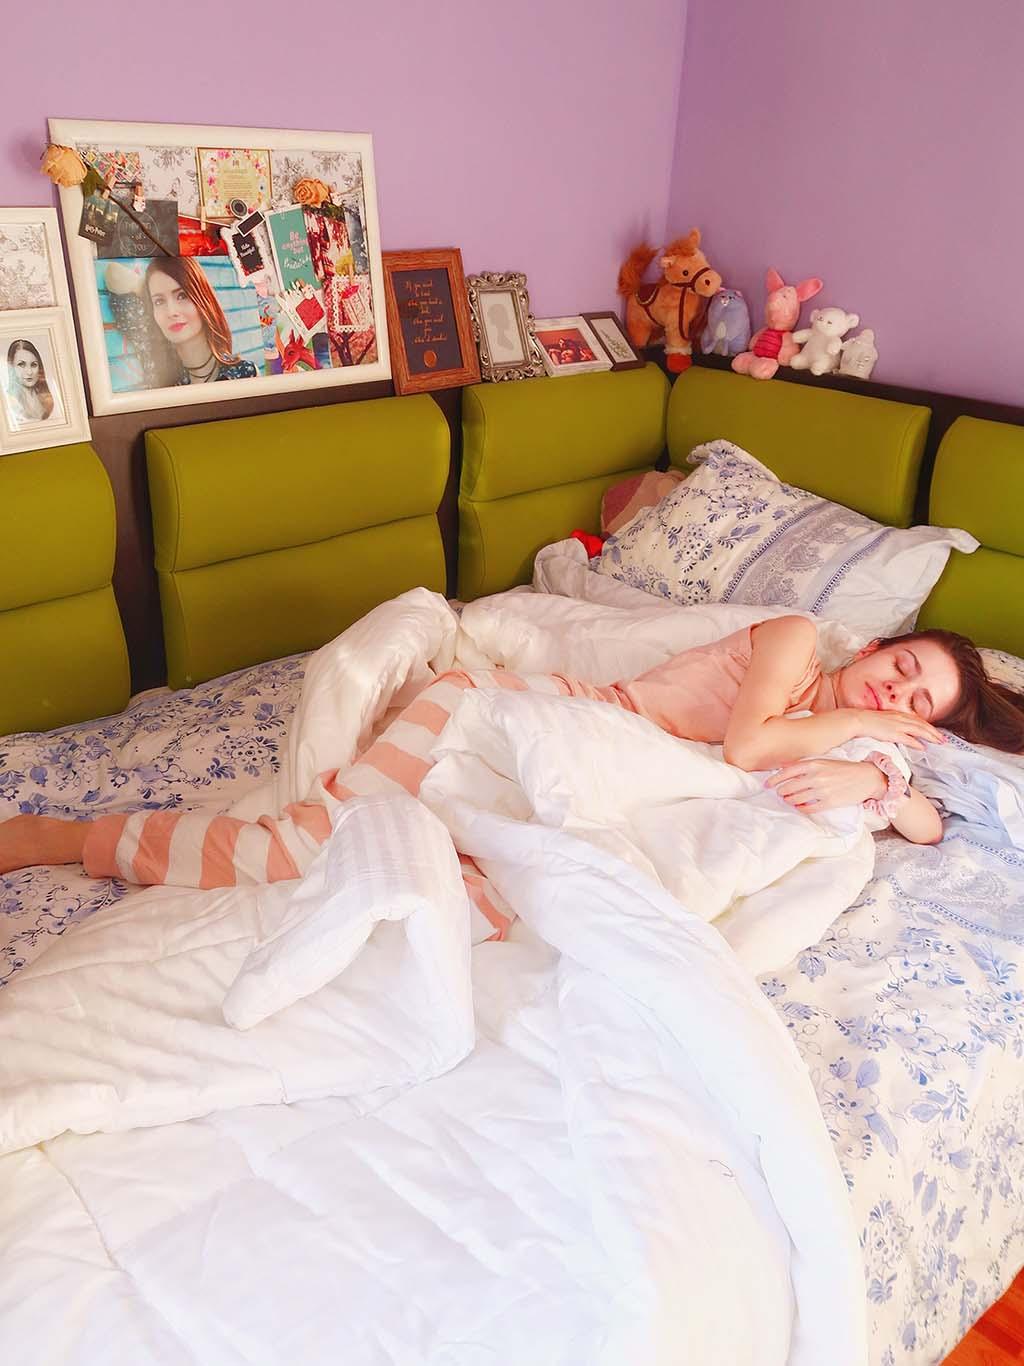 lenjerii deosebite pilota fibre bambus proprietari antimicrobiene alergii somn odihnitor